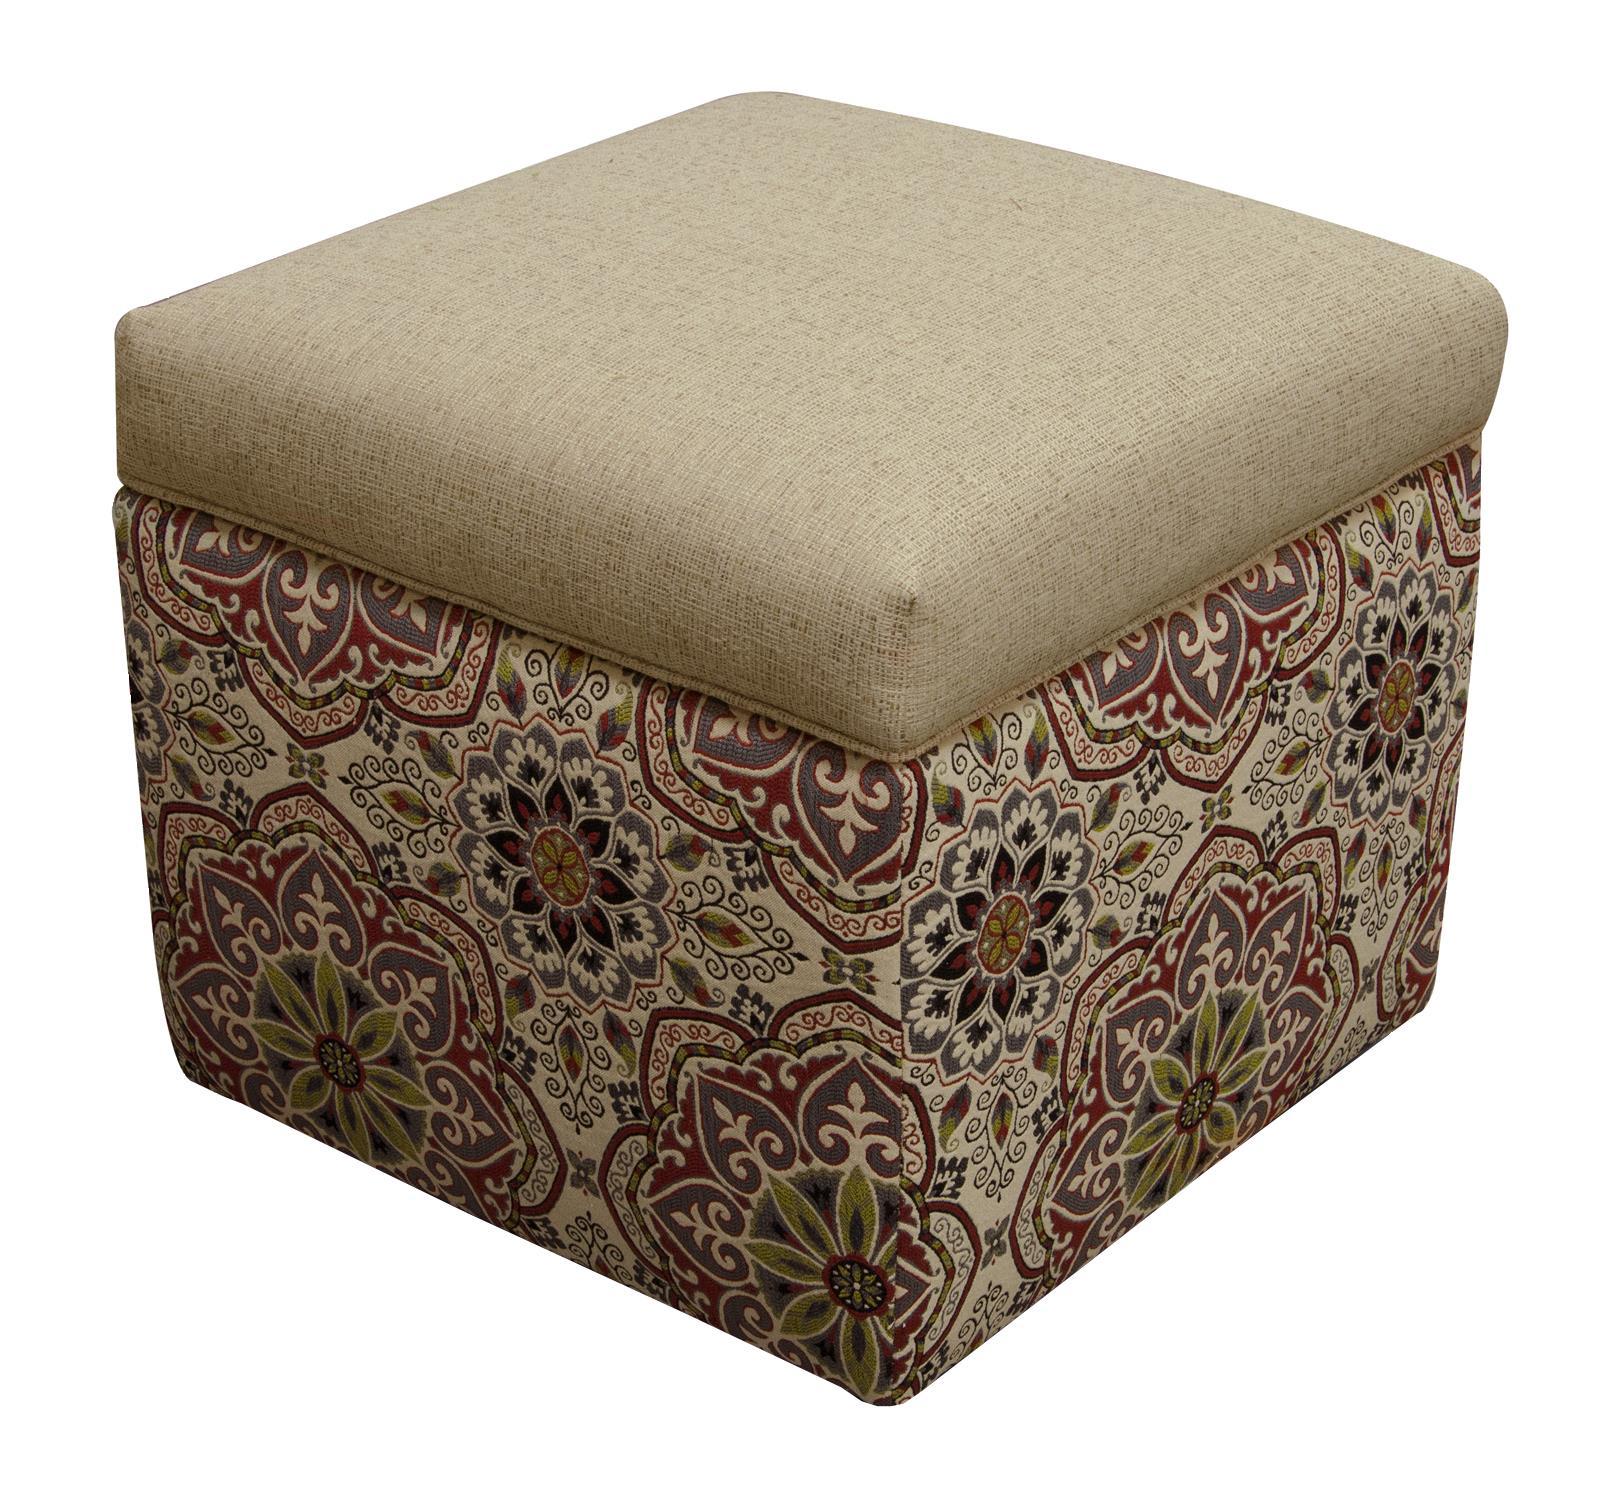 England Parson Storage Ottoman - Item Number: 2F00-81-7347